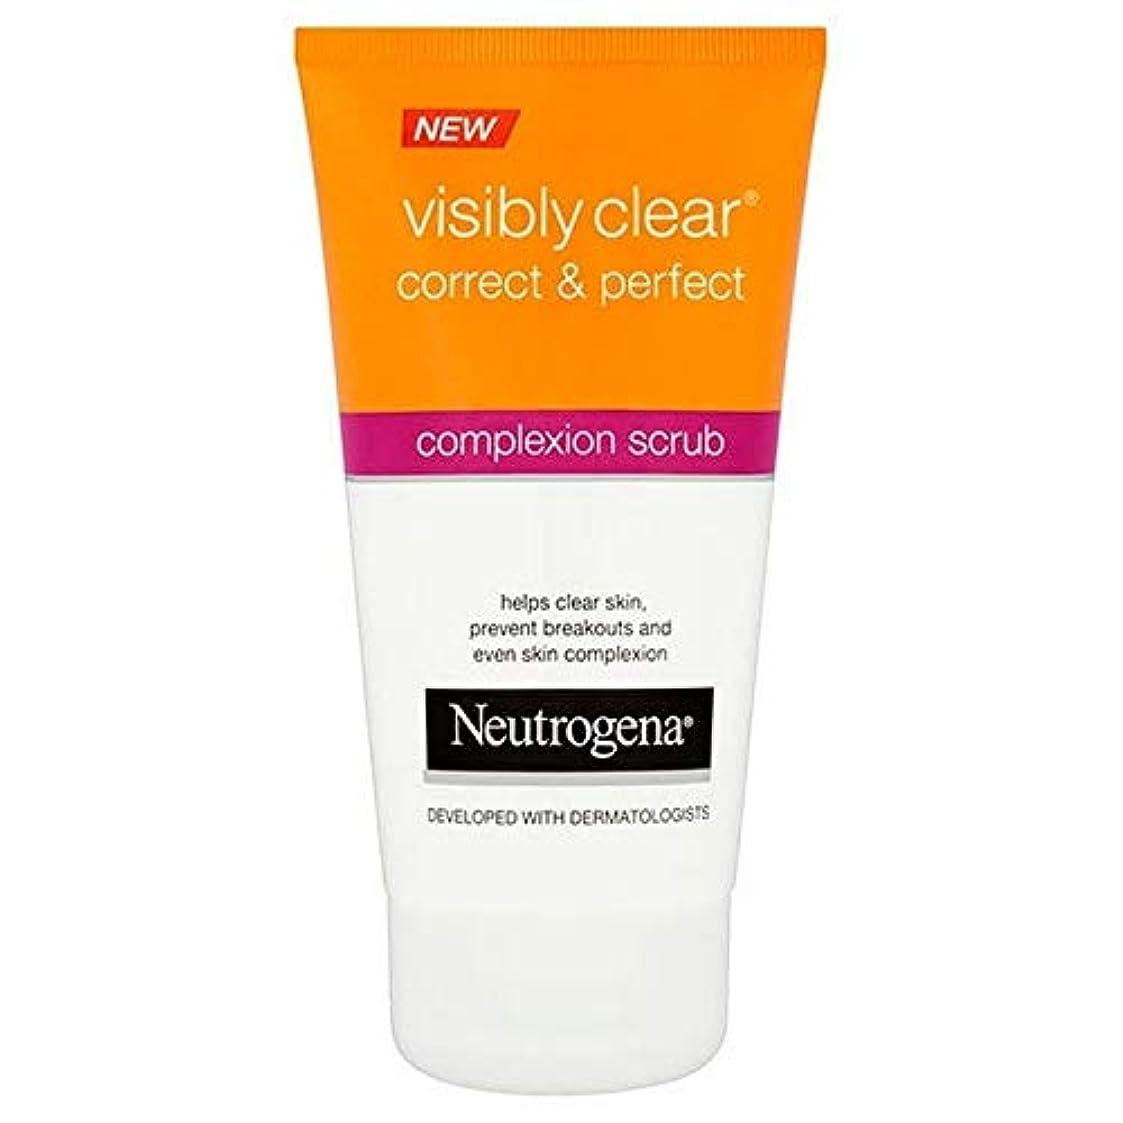 [Neutrogena] ニュートロジーナ目に見えて明らかに正しいと完璧な顔色スクラブ - Neutrogena Visibly Clear Correct & Perfect Complexion Scrub [並行輸入品]